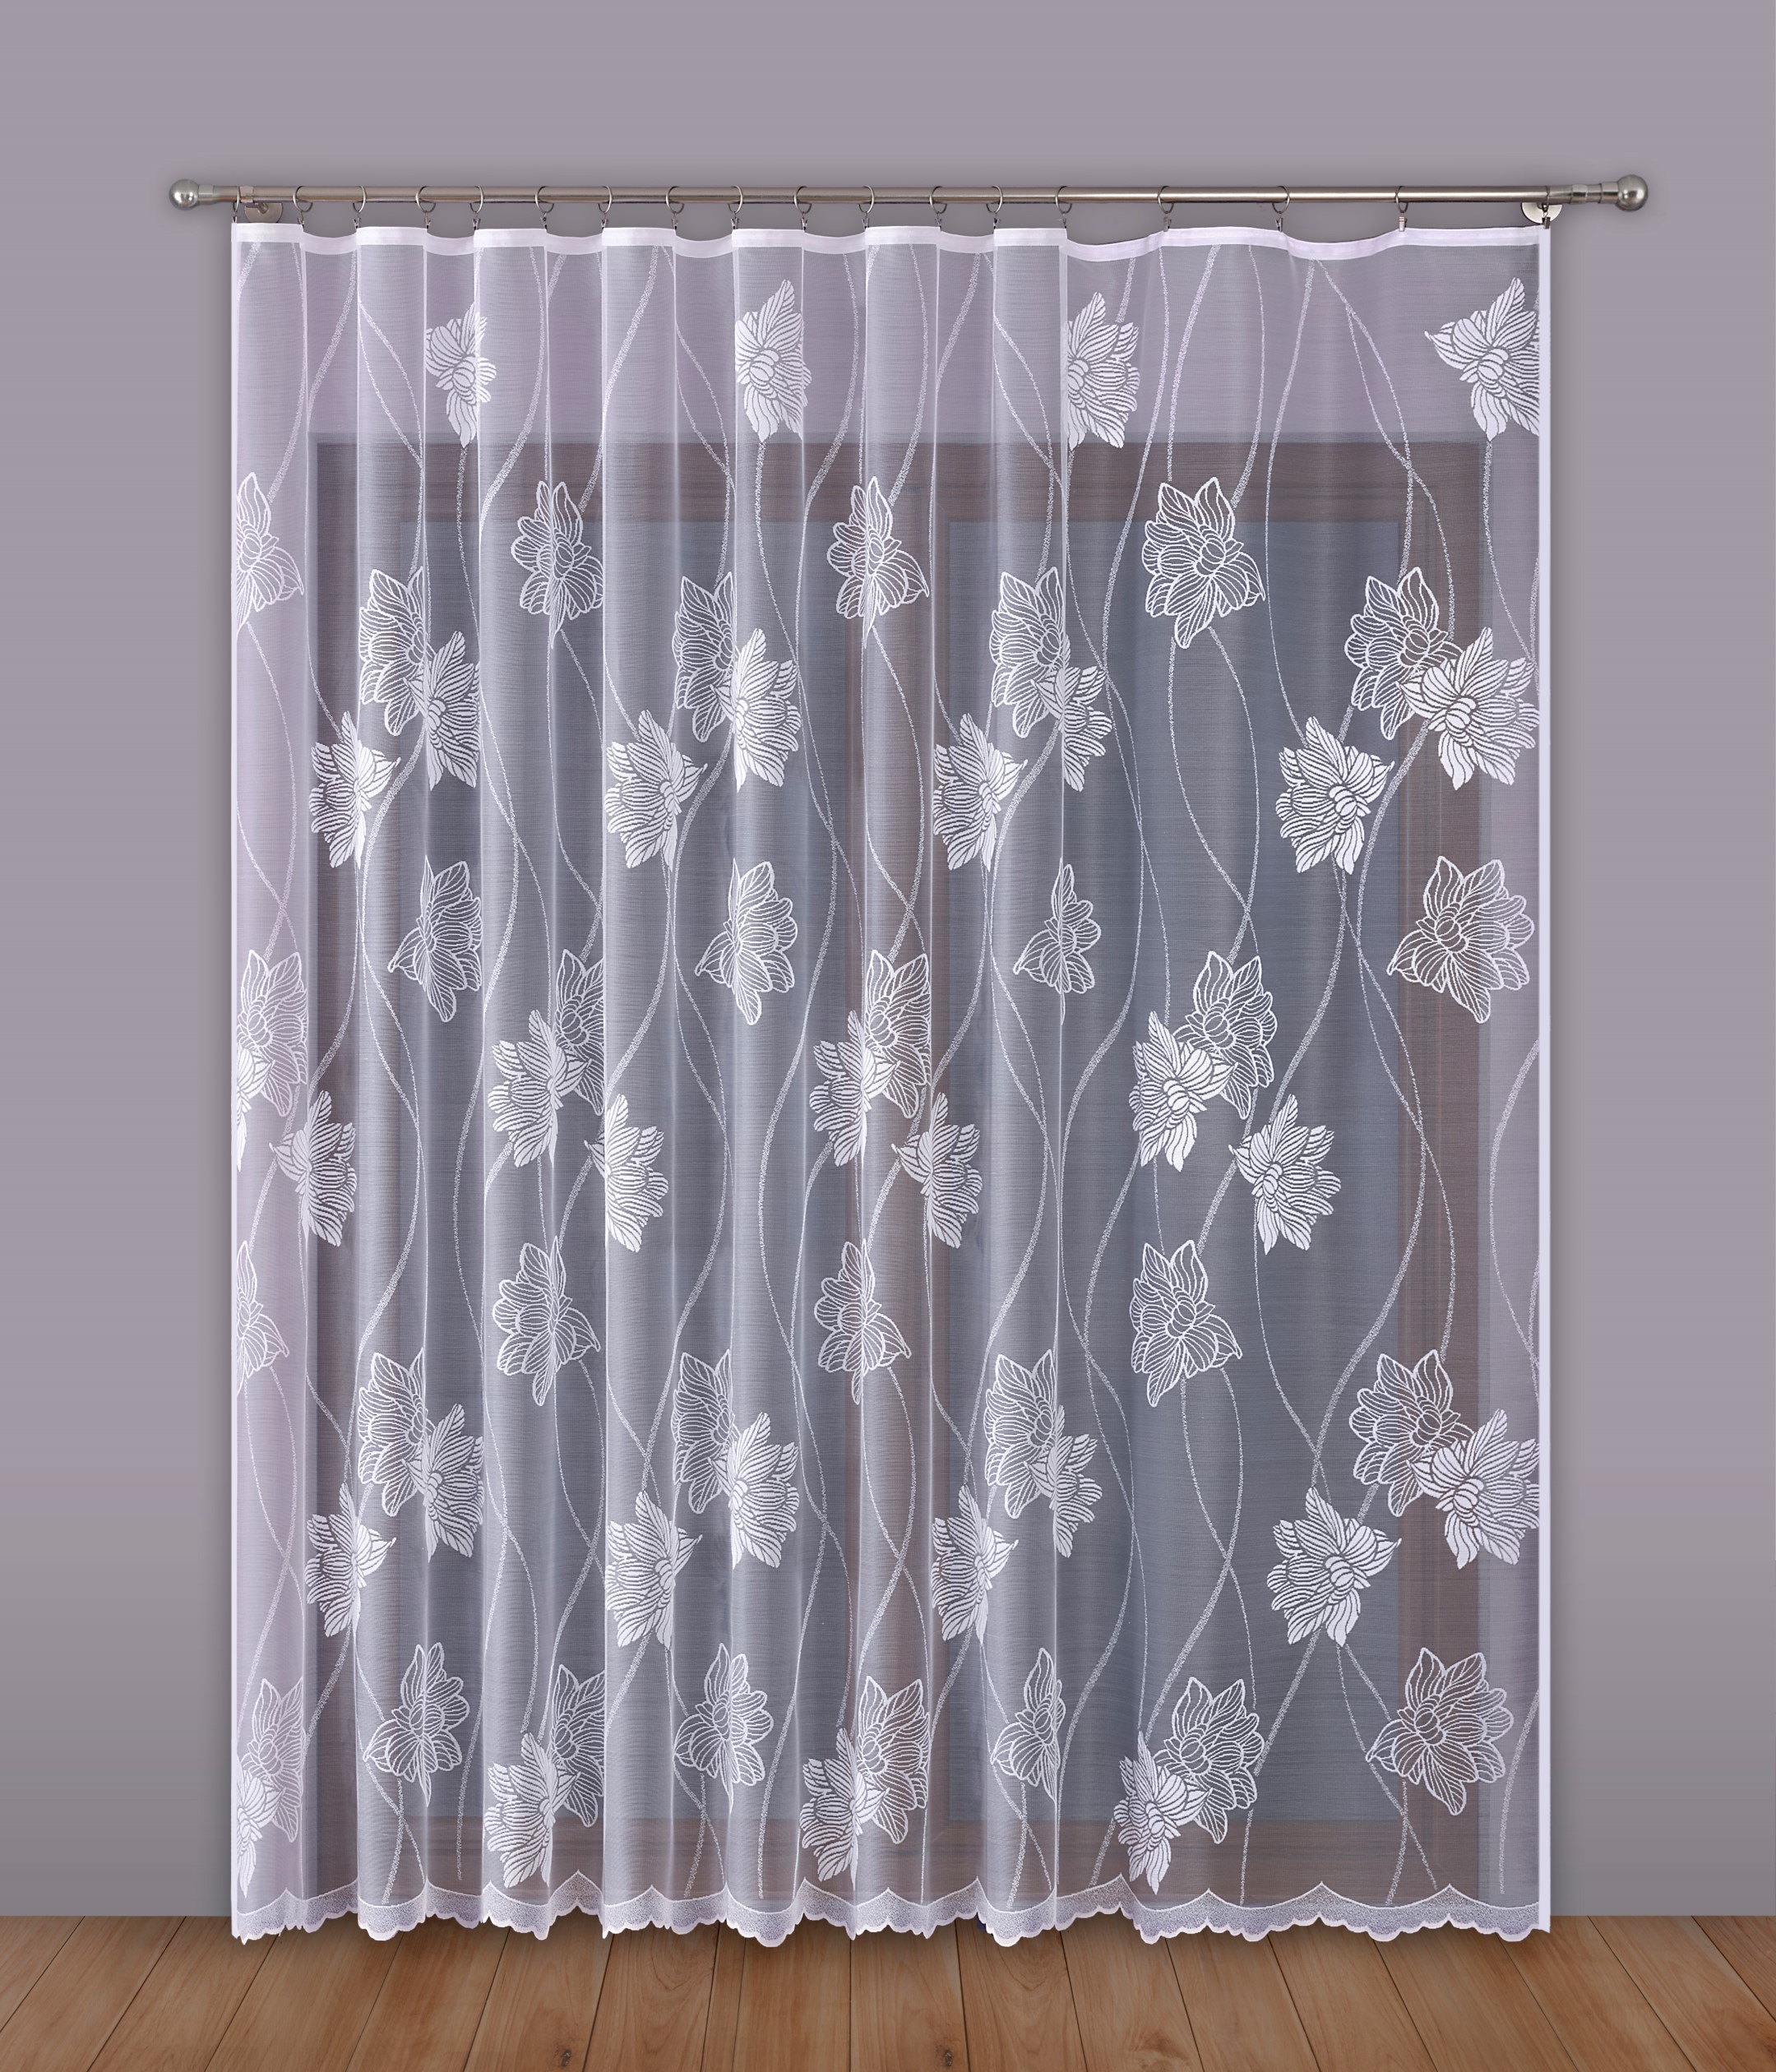 Шторы Primavera Классические шторы Thyrza Цвет: Белый шторы kauffort классические шторы barolo